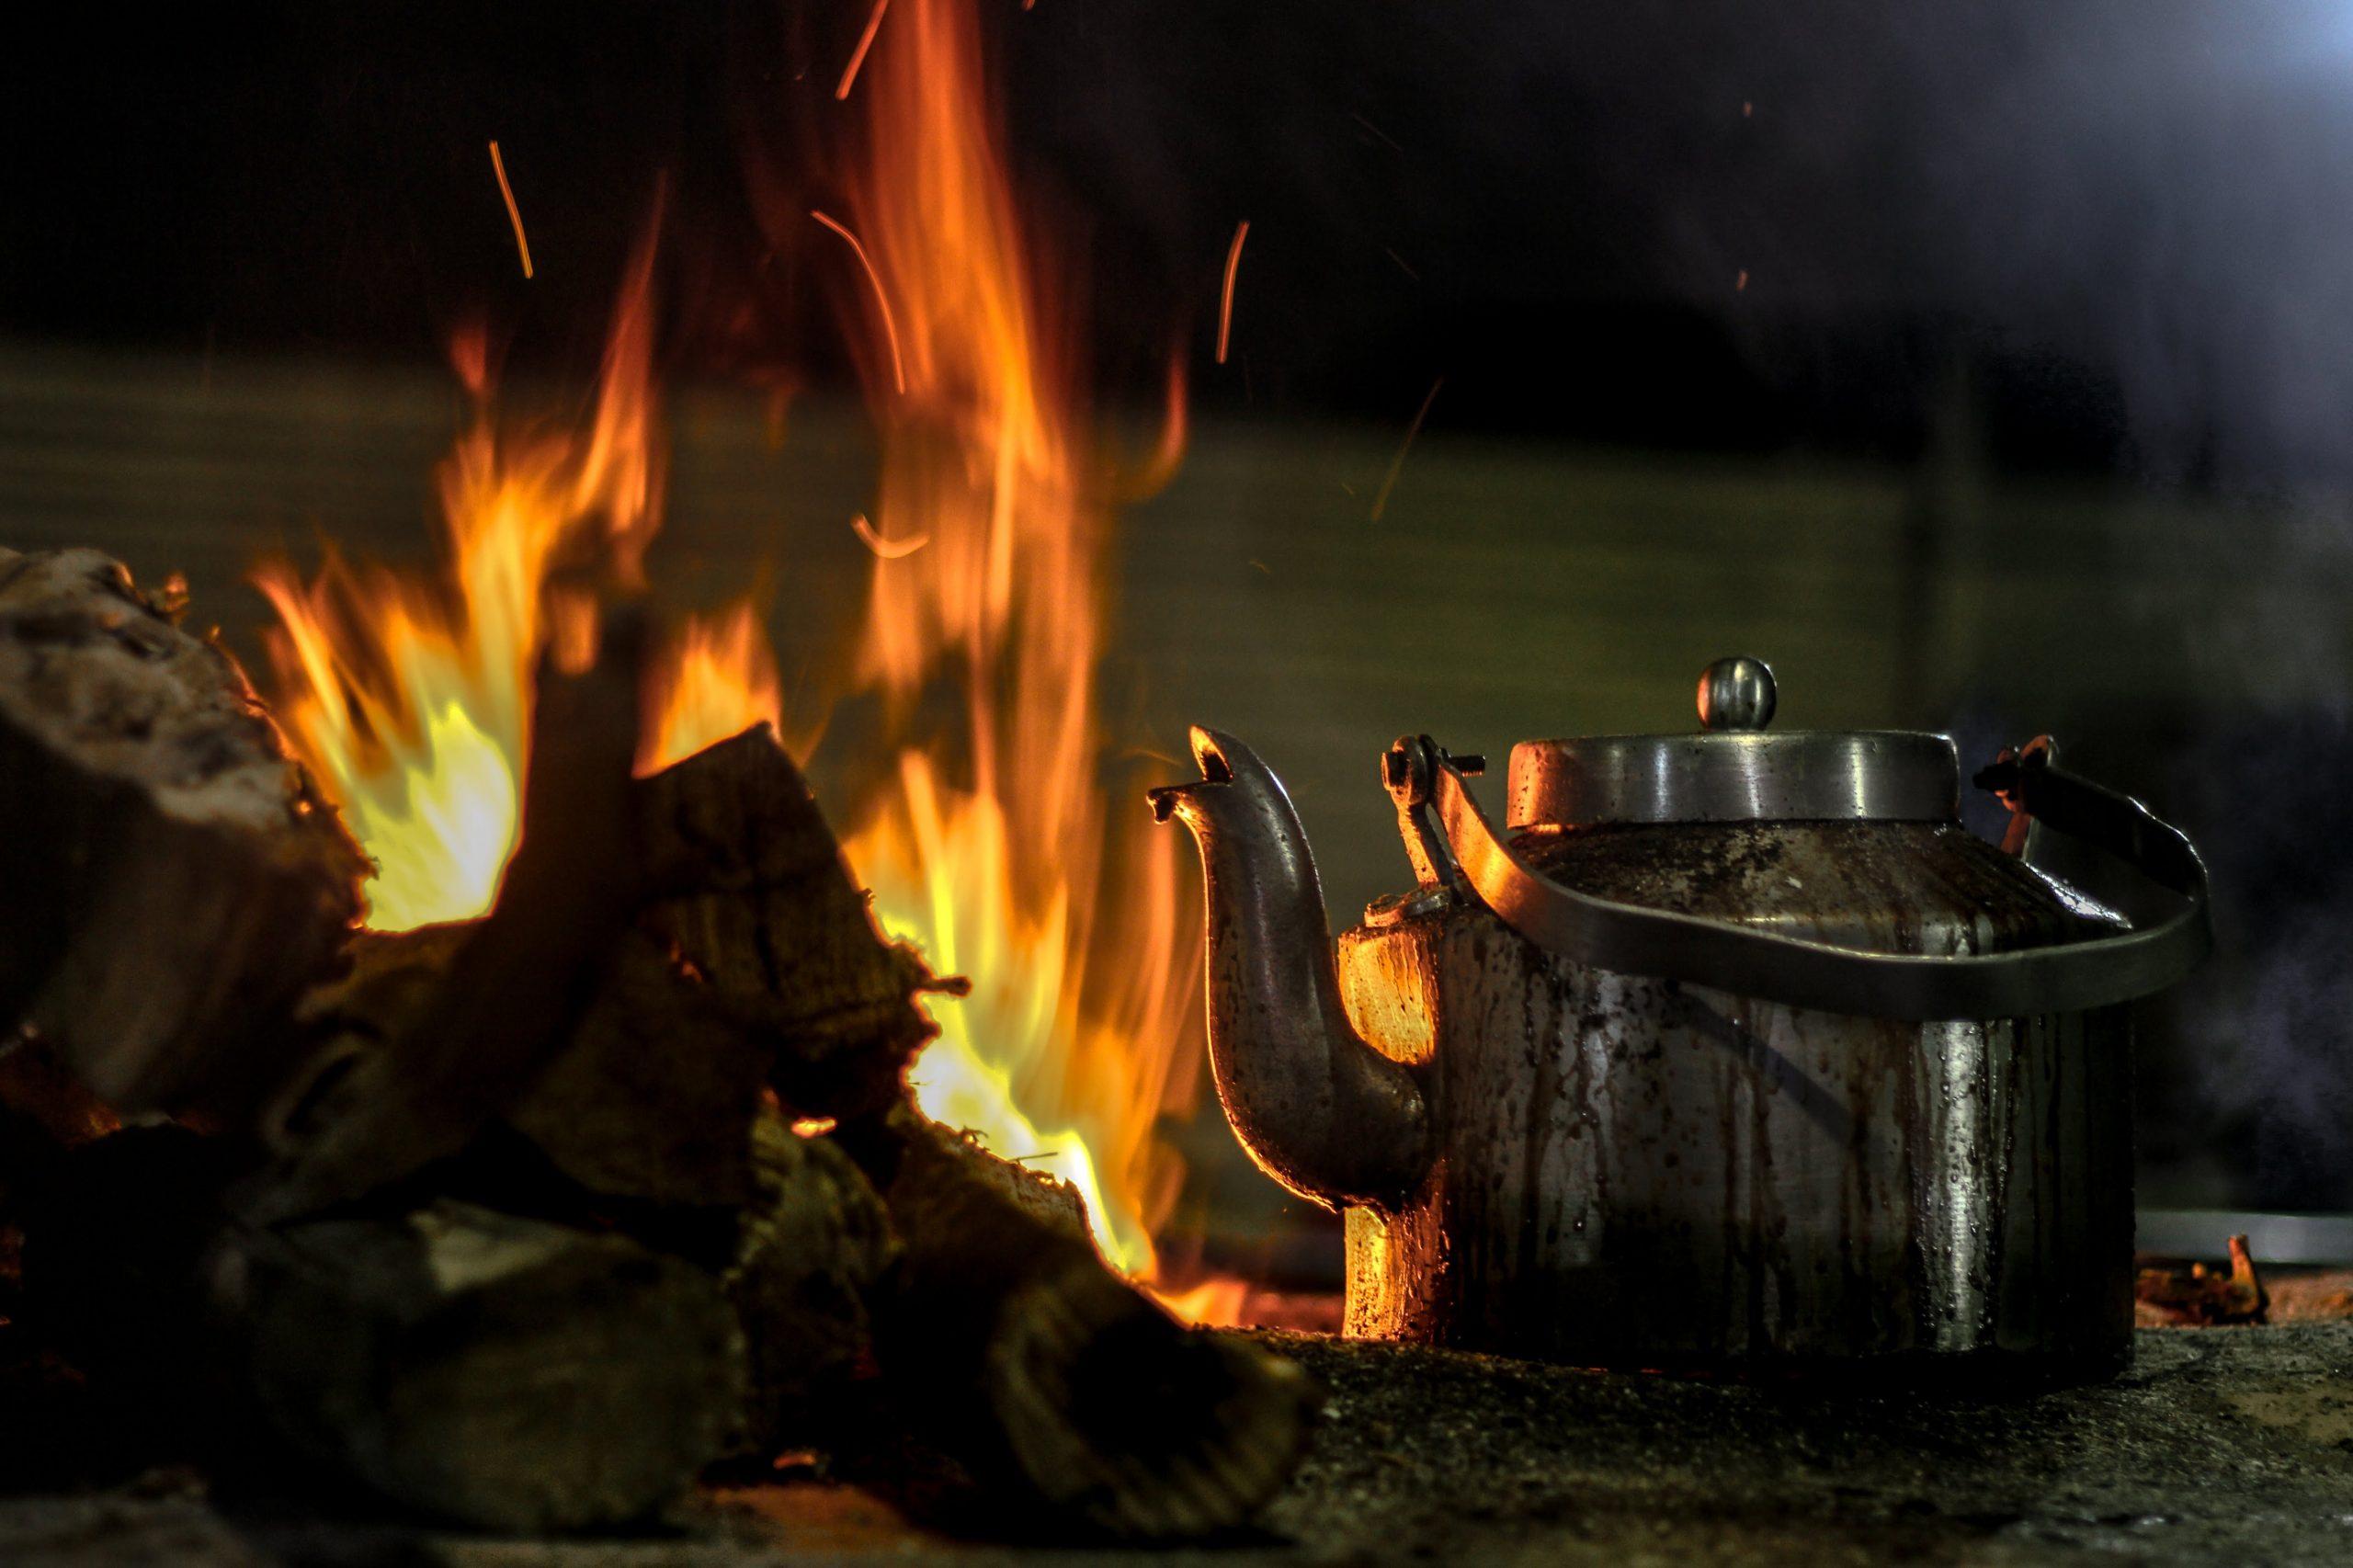 Teapot near flame